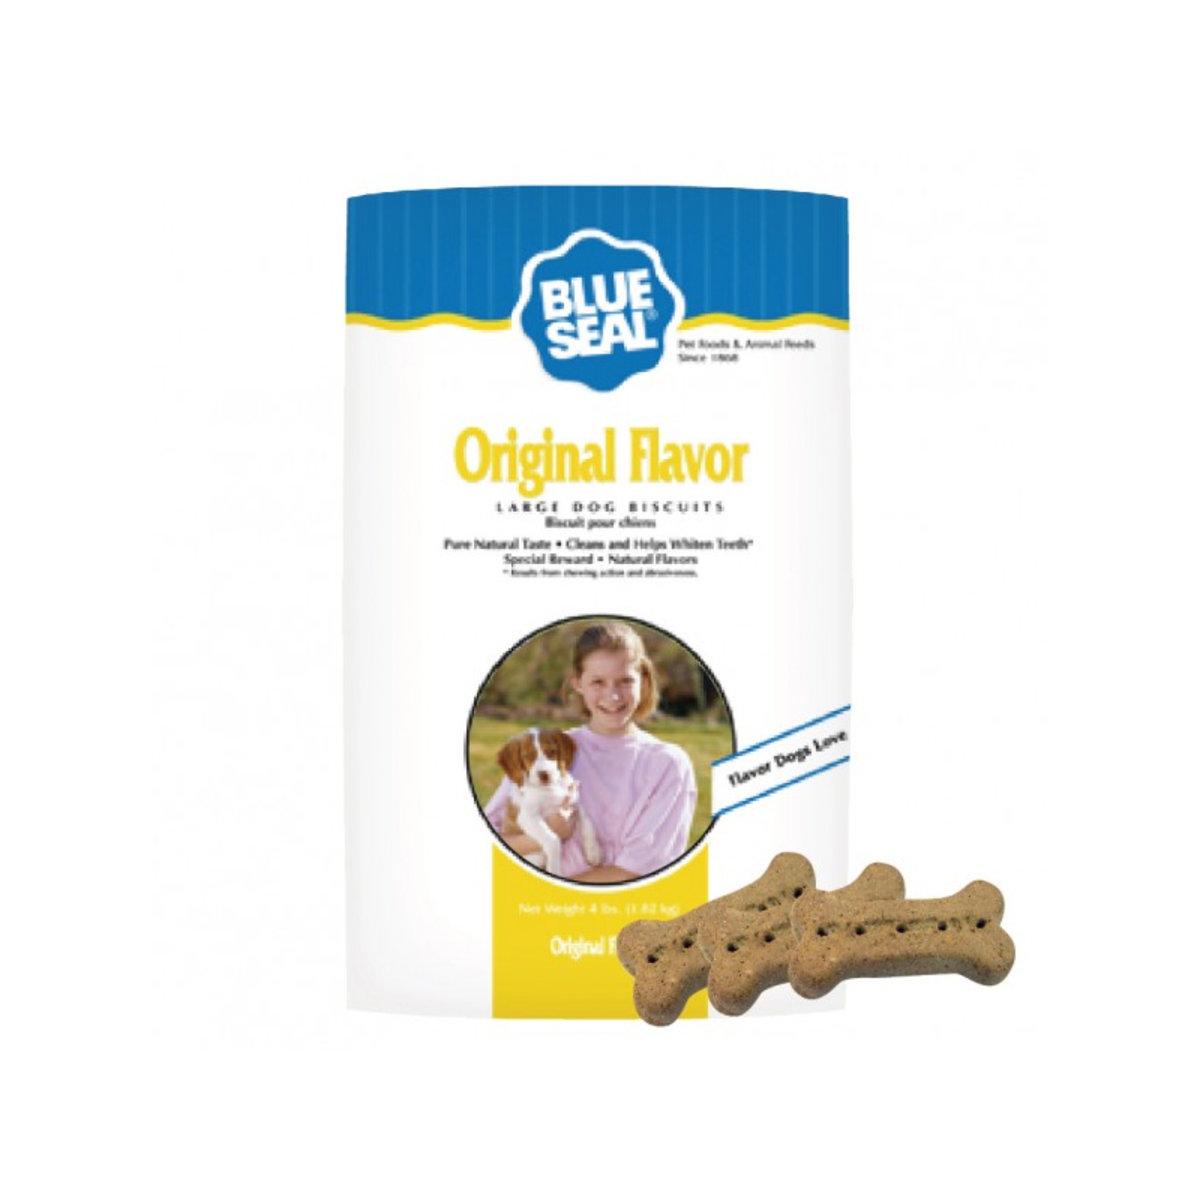 Original Plain Small Dog Biscuits